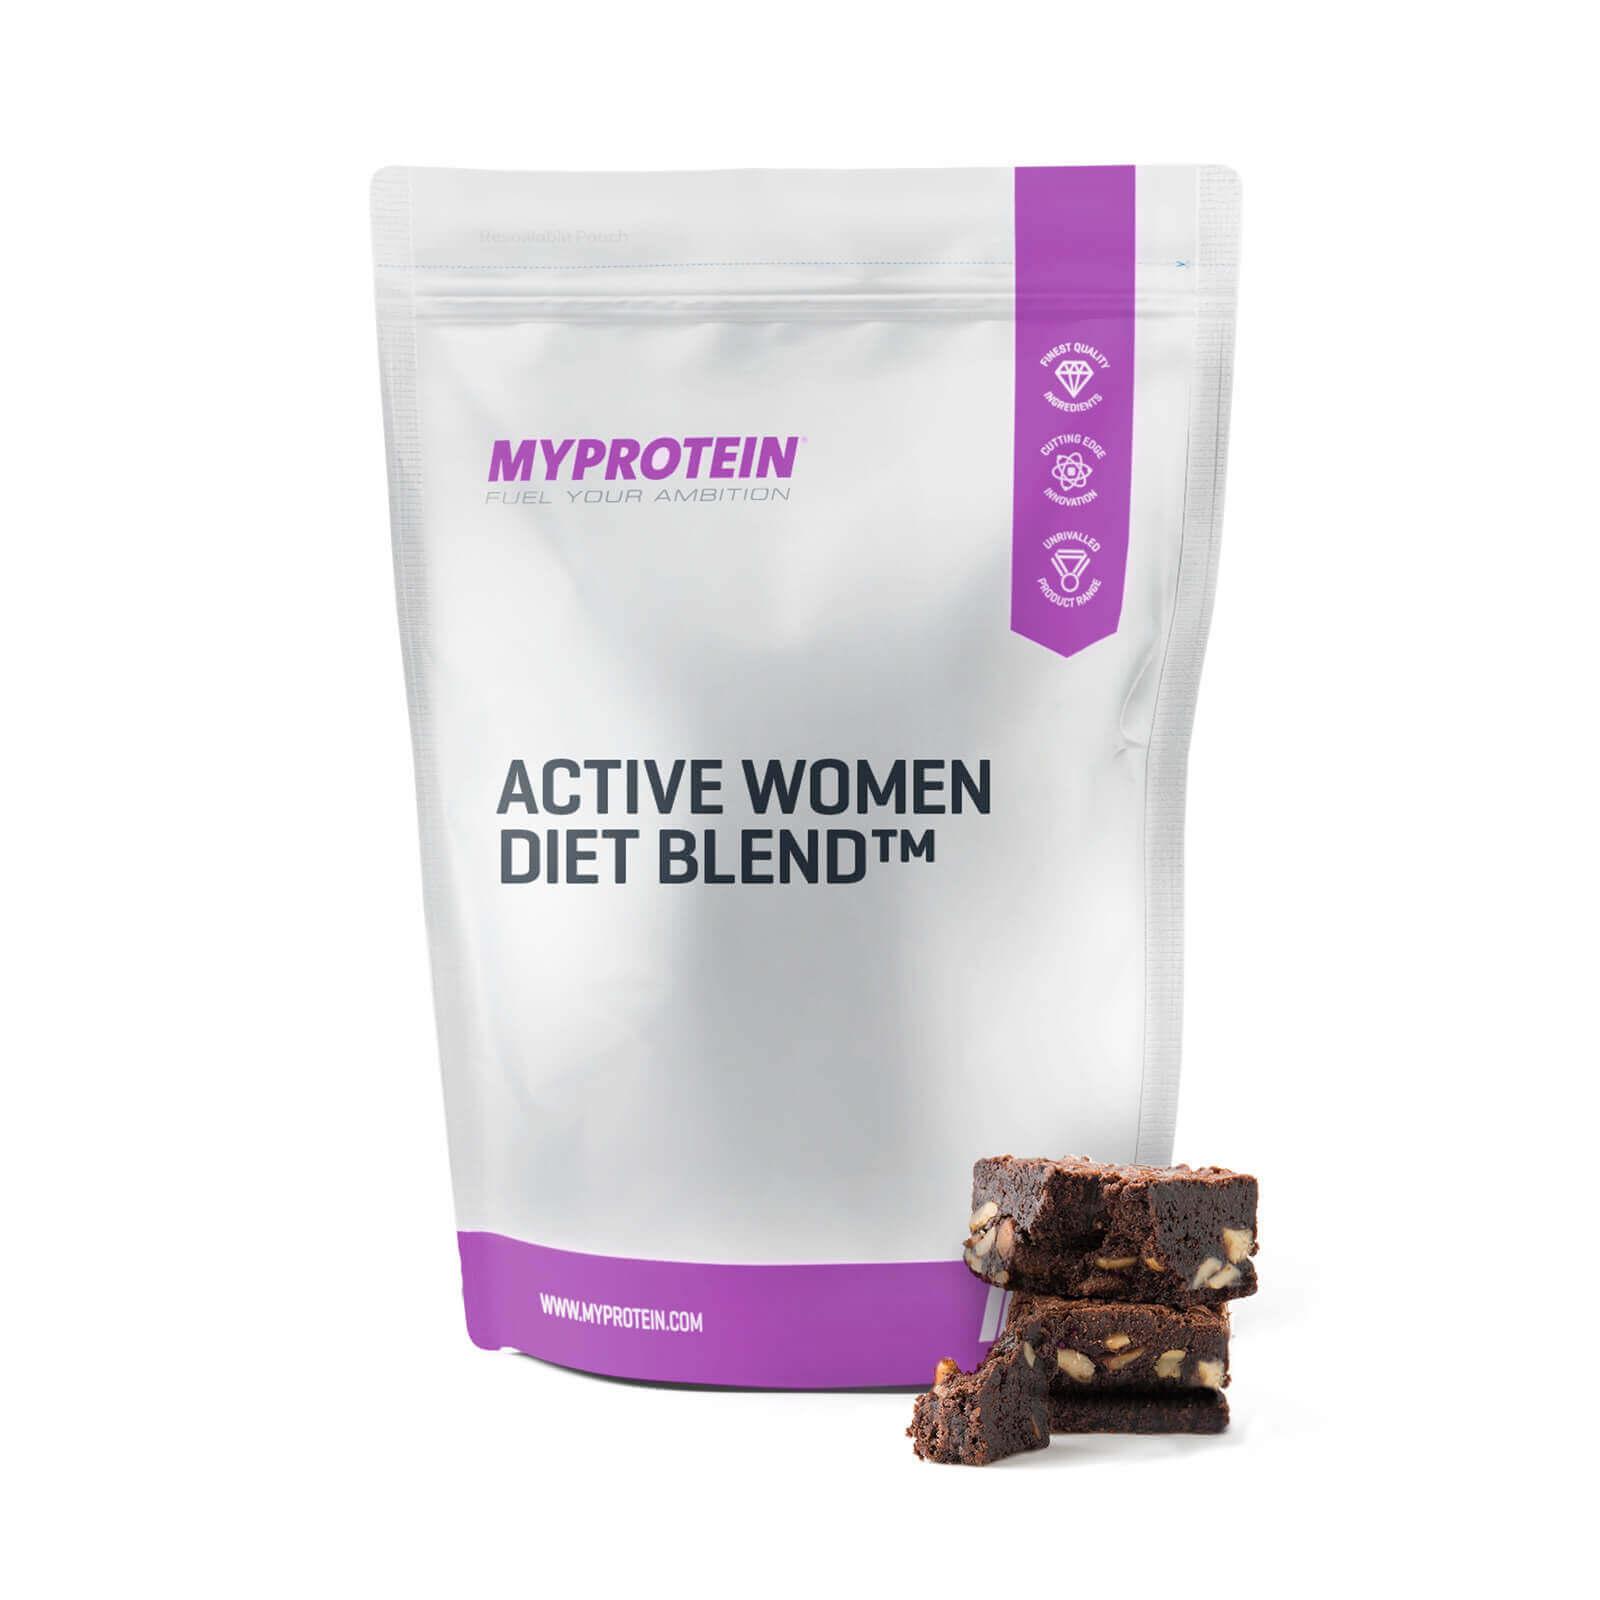 Active Women Diet Blend™